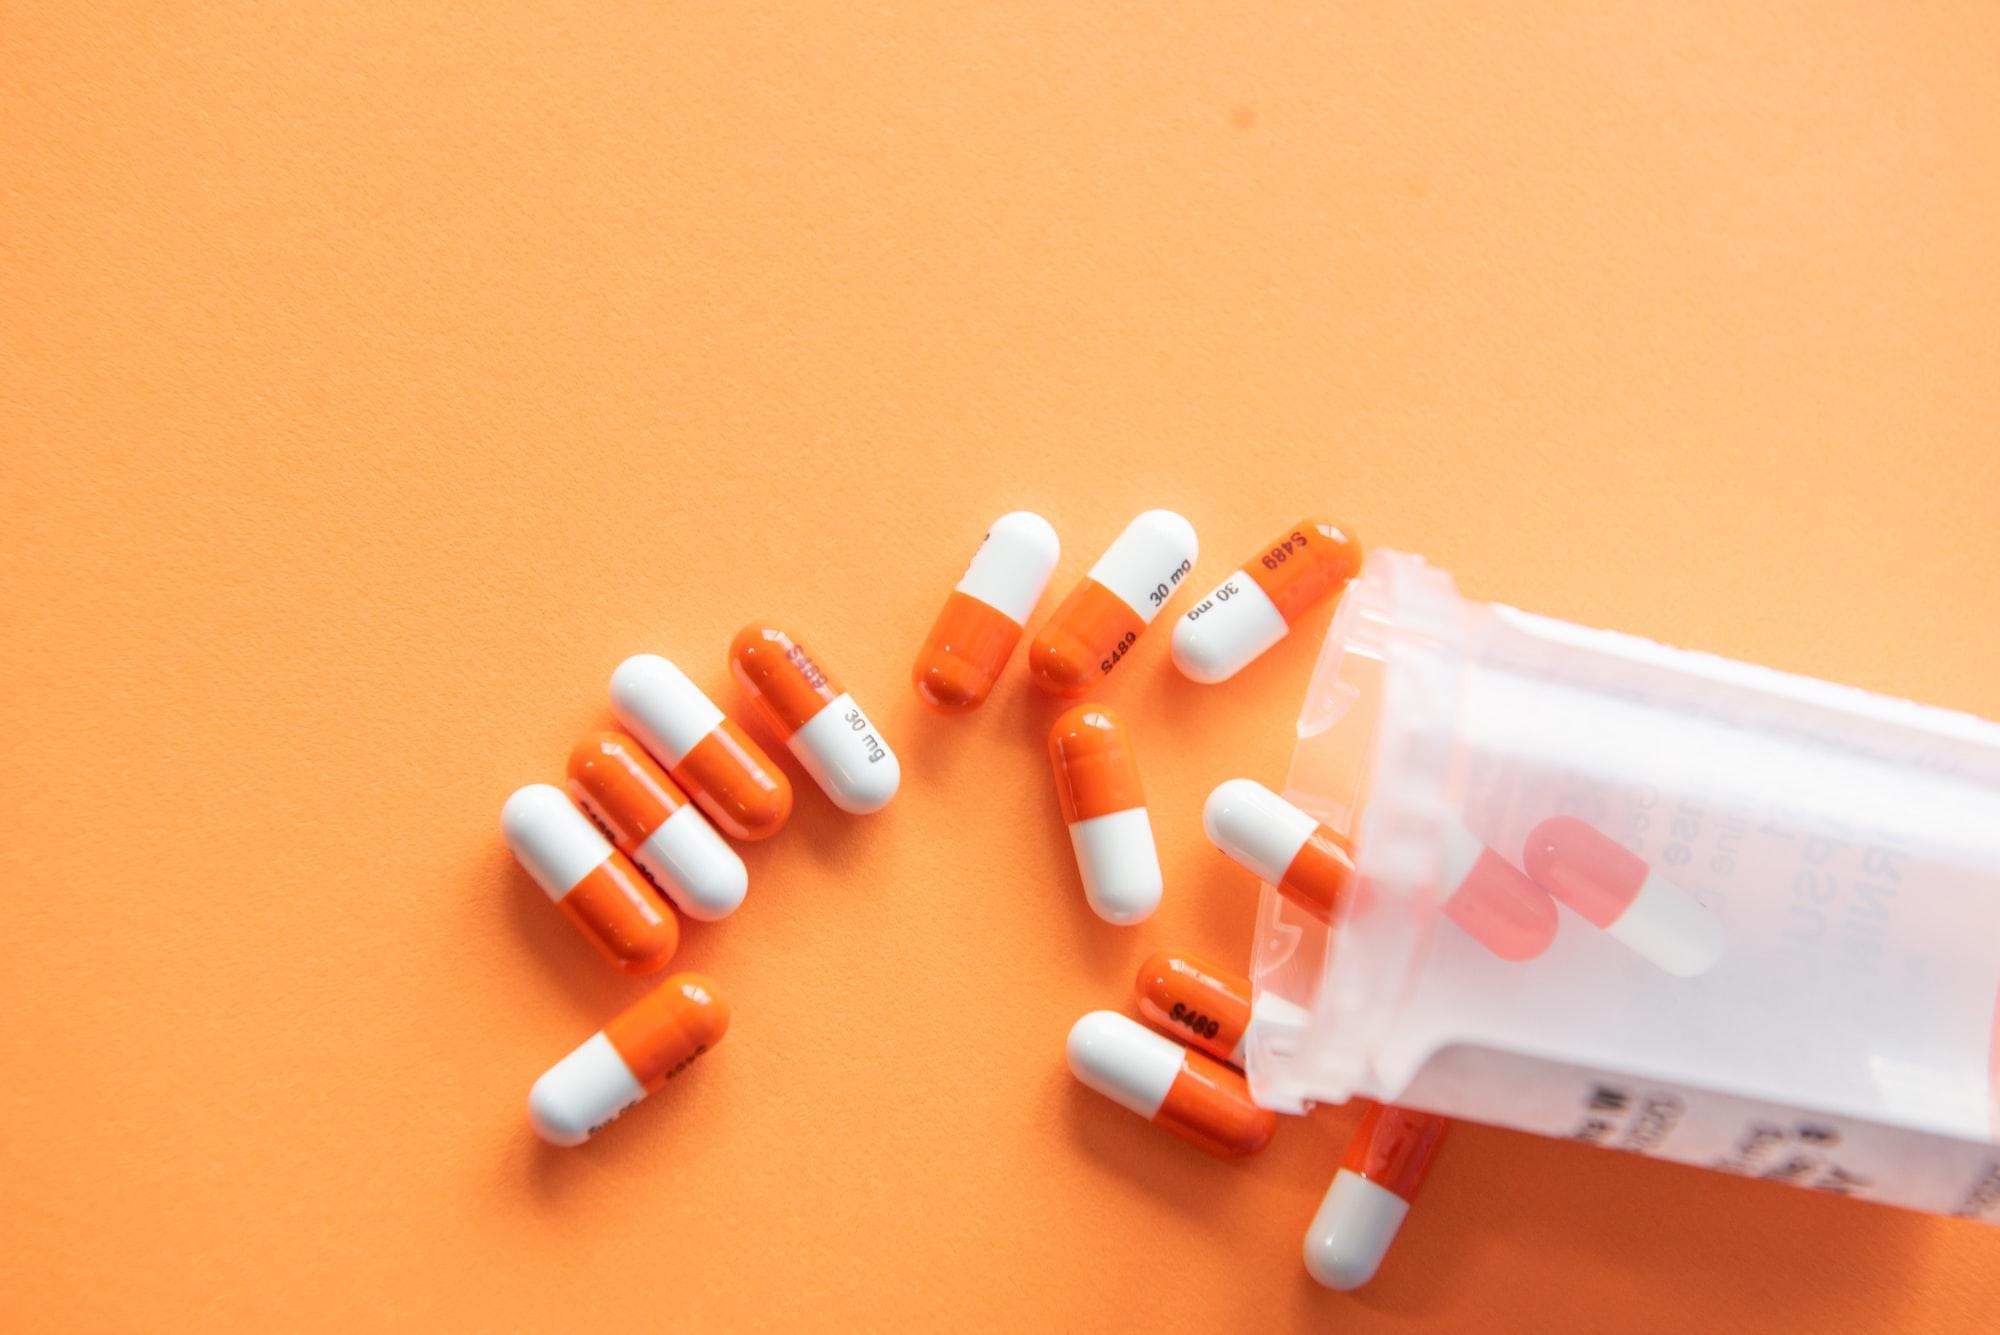 Prescription drugs on an orange background with a pill bottle. Orange pills.